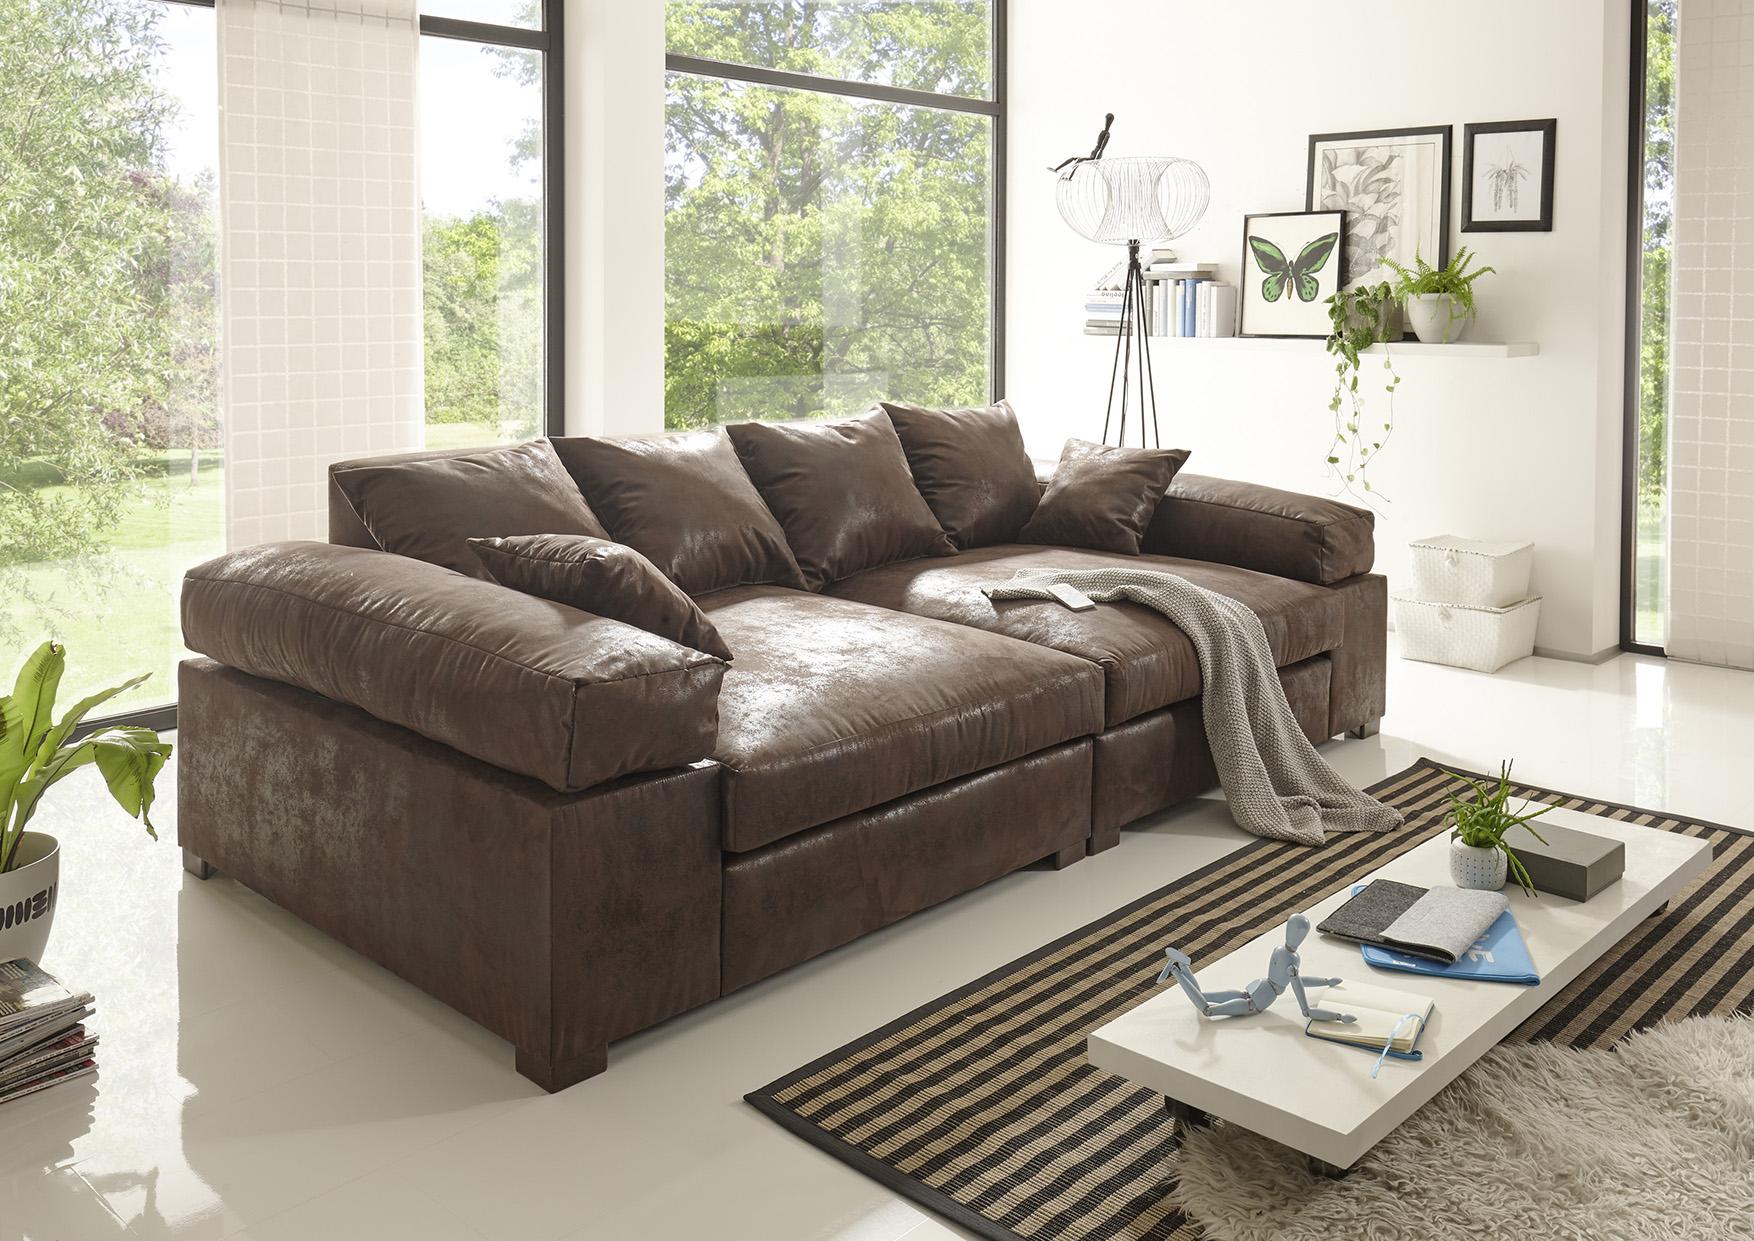 big sofa couchgarnitur megasofa riesensofa arezzo. Black Bedroom Furniture Sets. Home Design Ideas